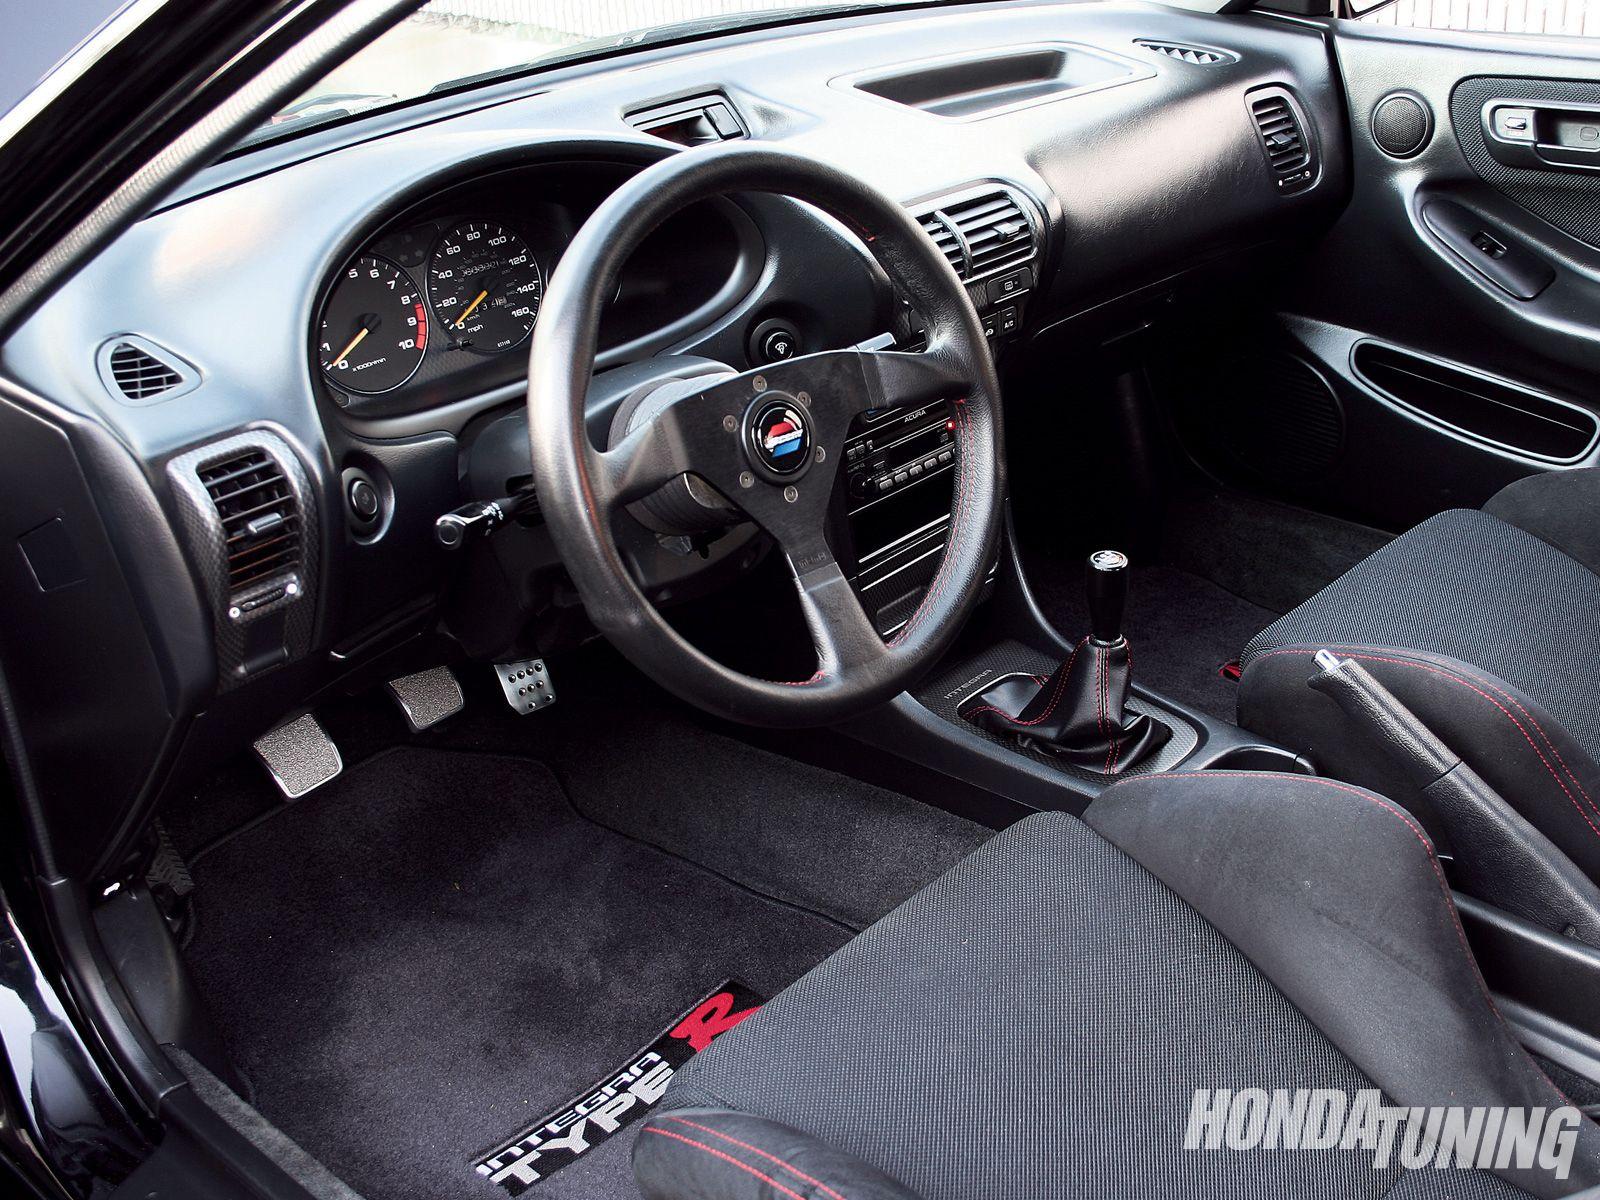 2000 Acura Integra Type R Specs 2016 2016 Car Release